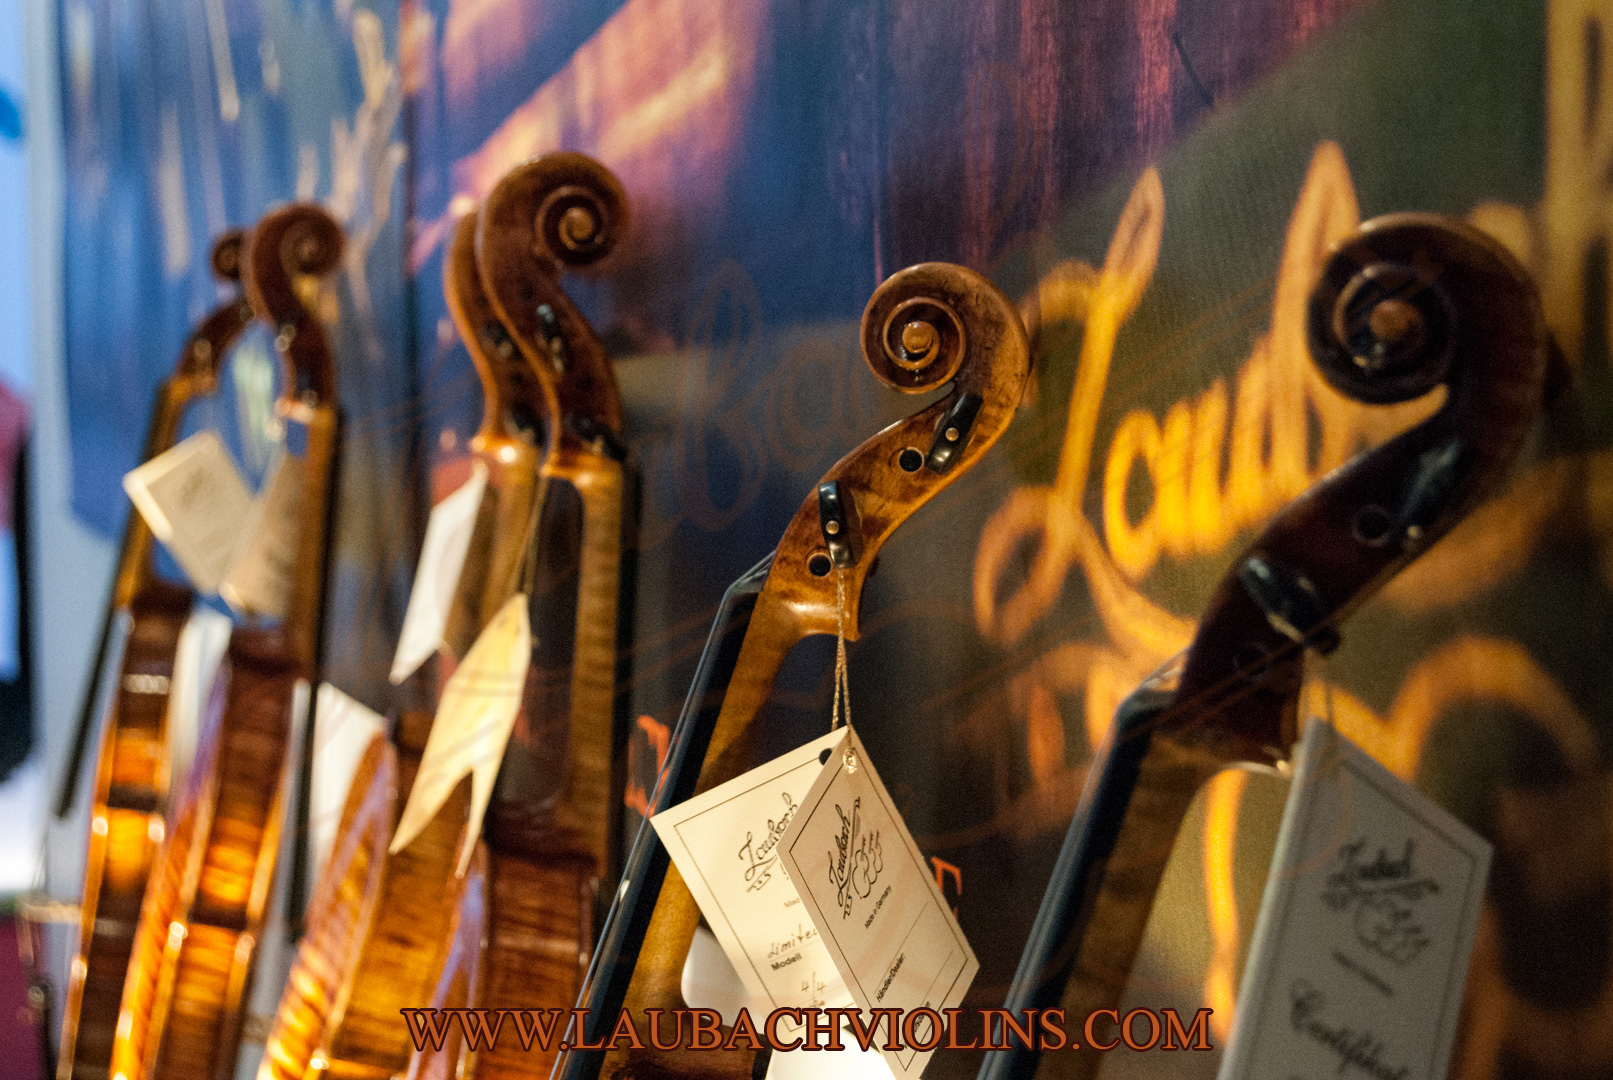 laubach_musikmesse_frankfurt_2017_13.jpg